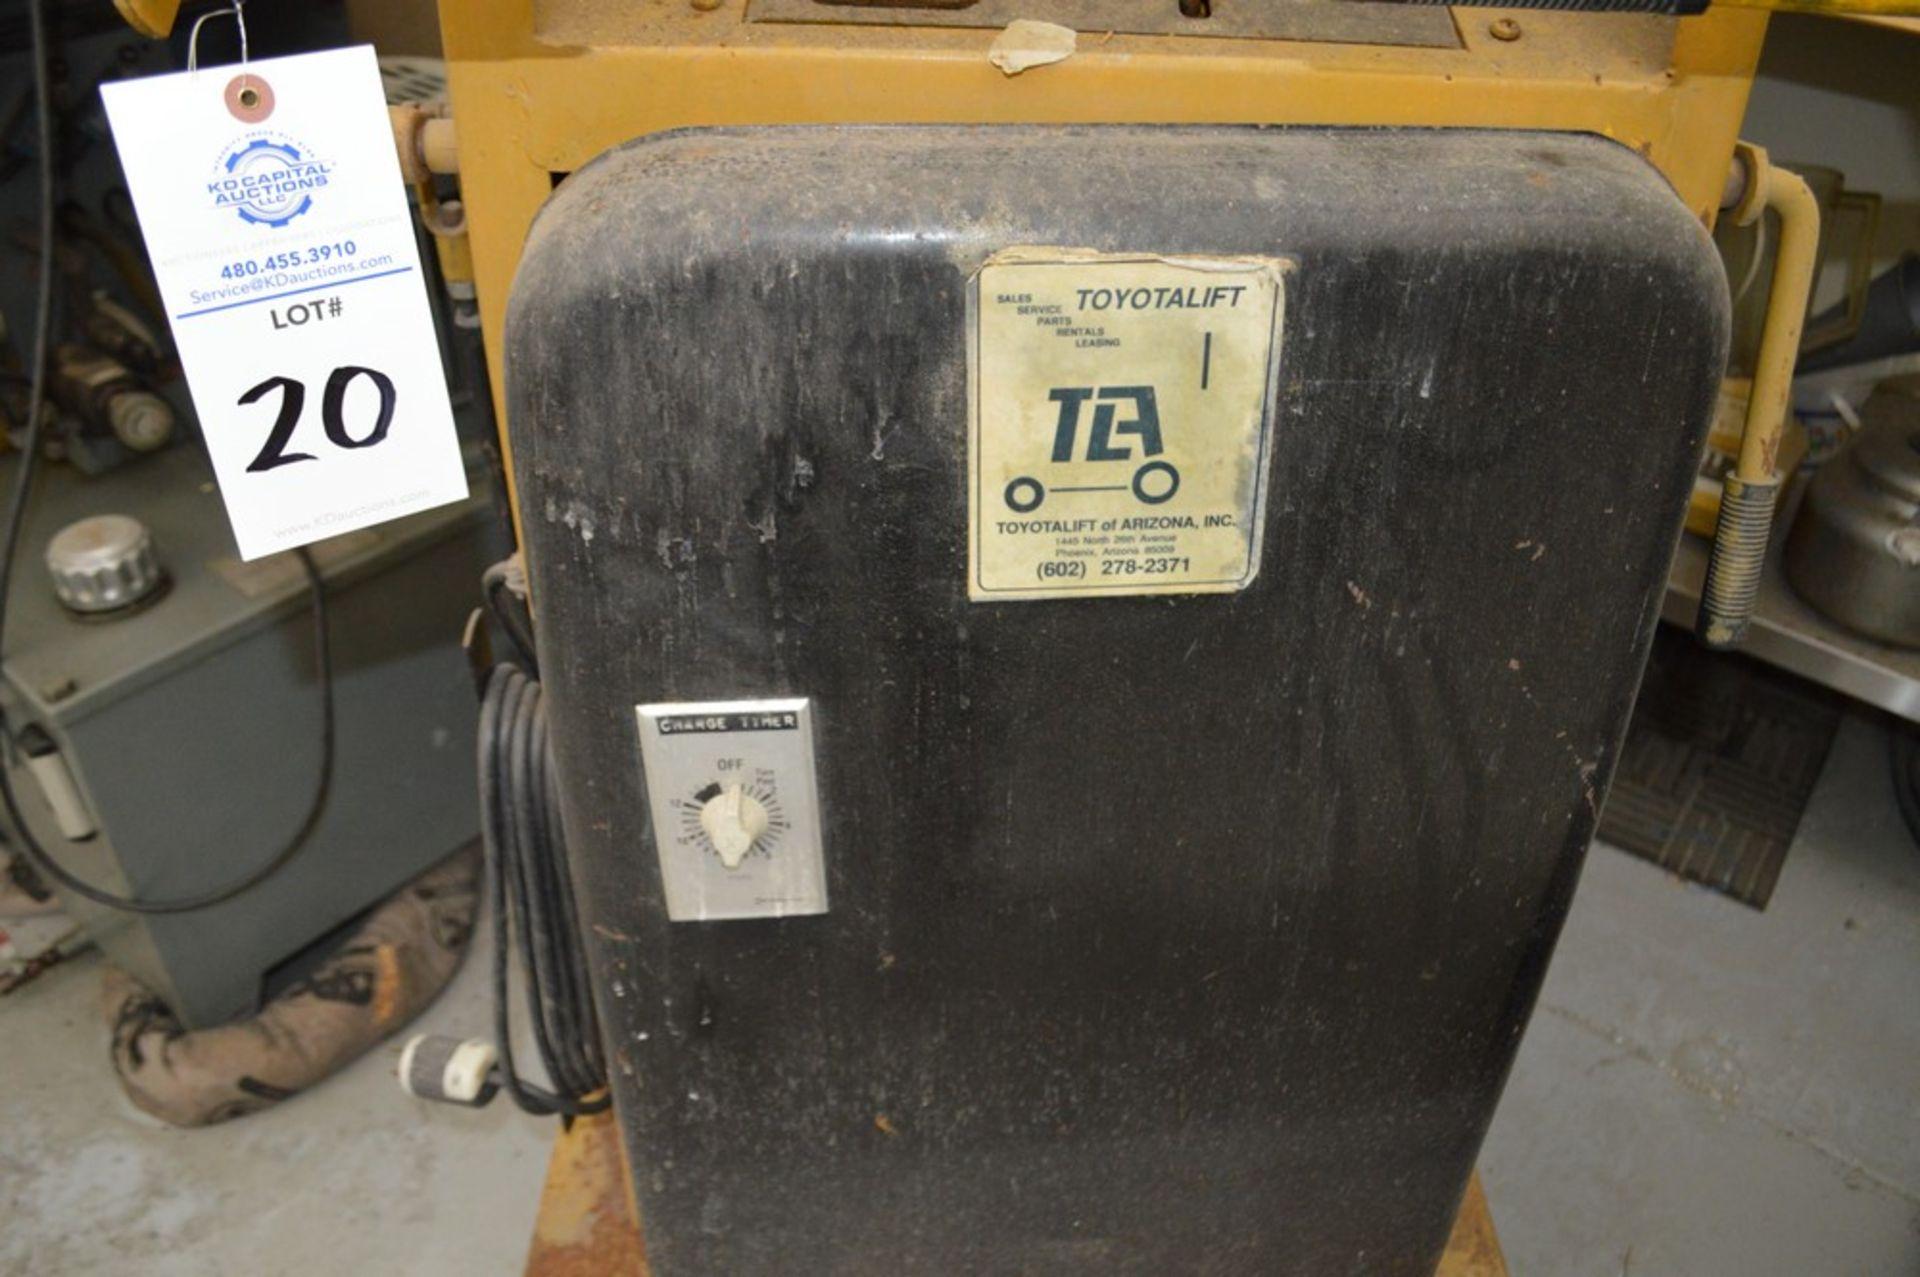 Toyota Lift Big Joe Lift, battery with internal charger - Image 3 of 7